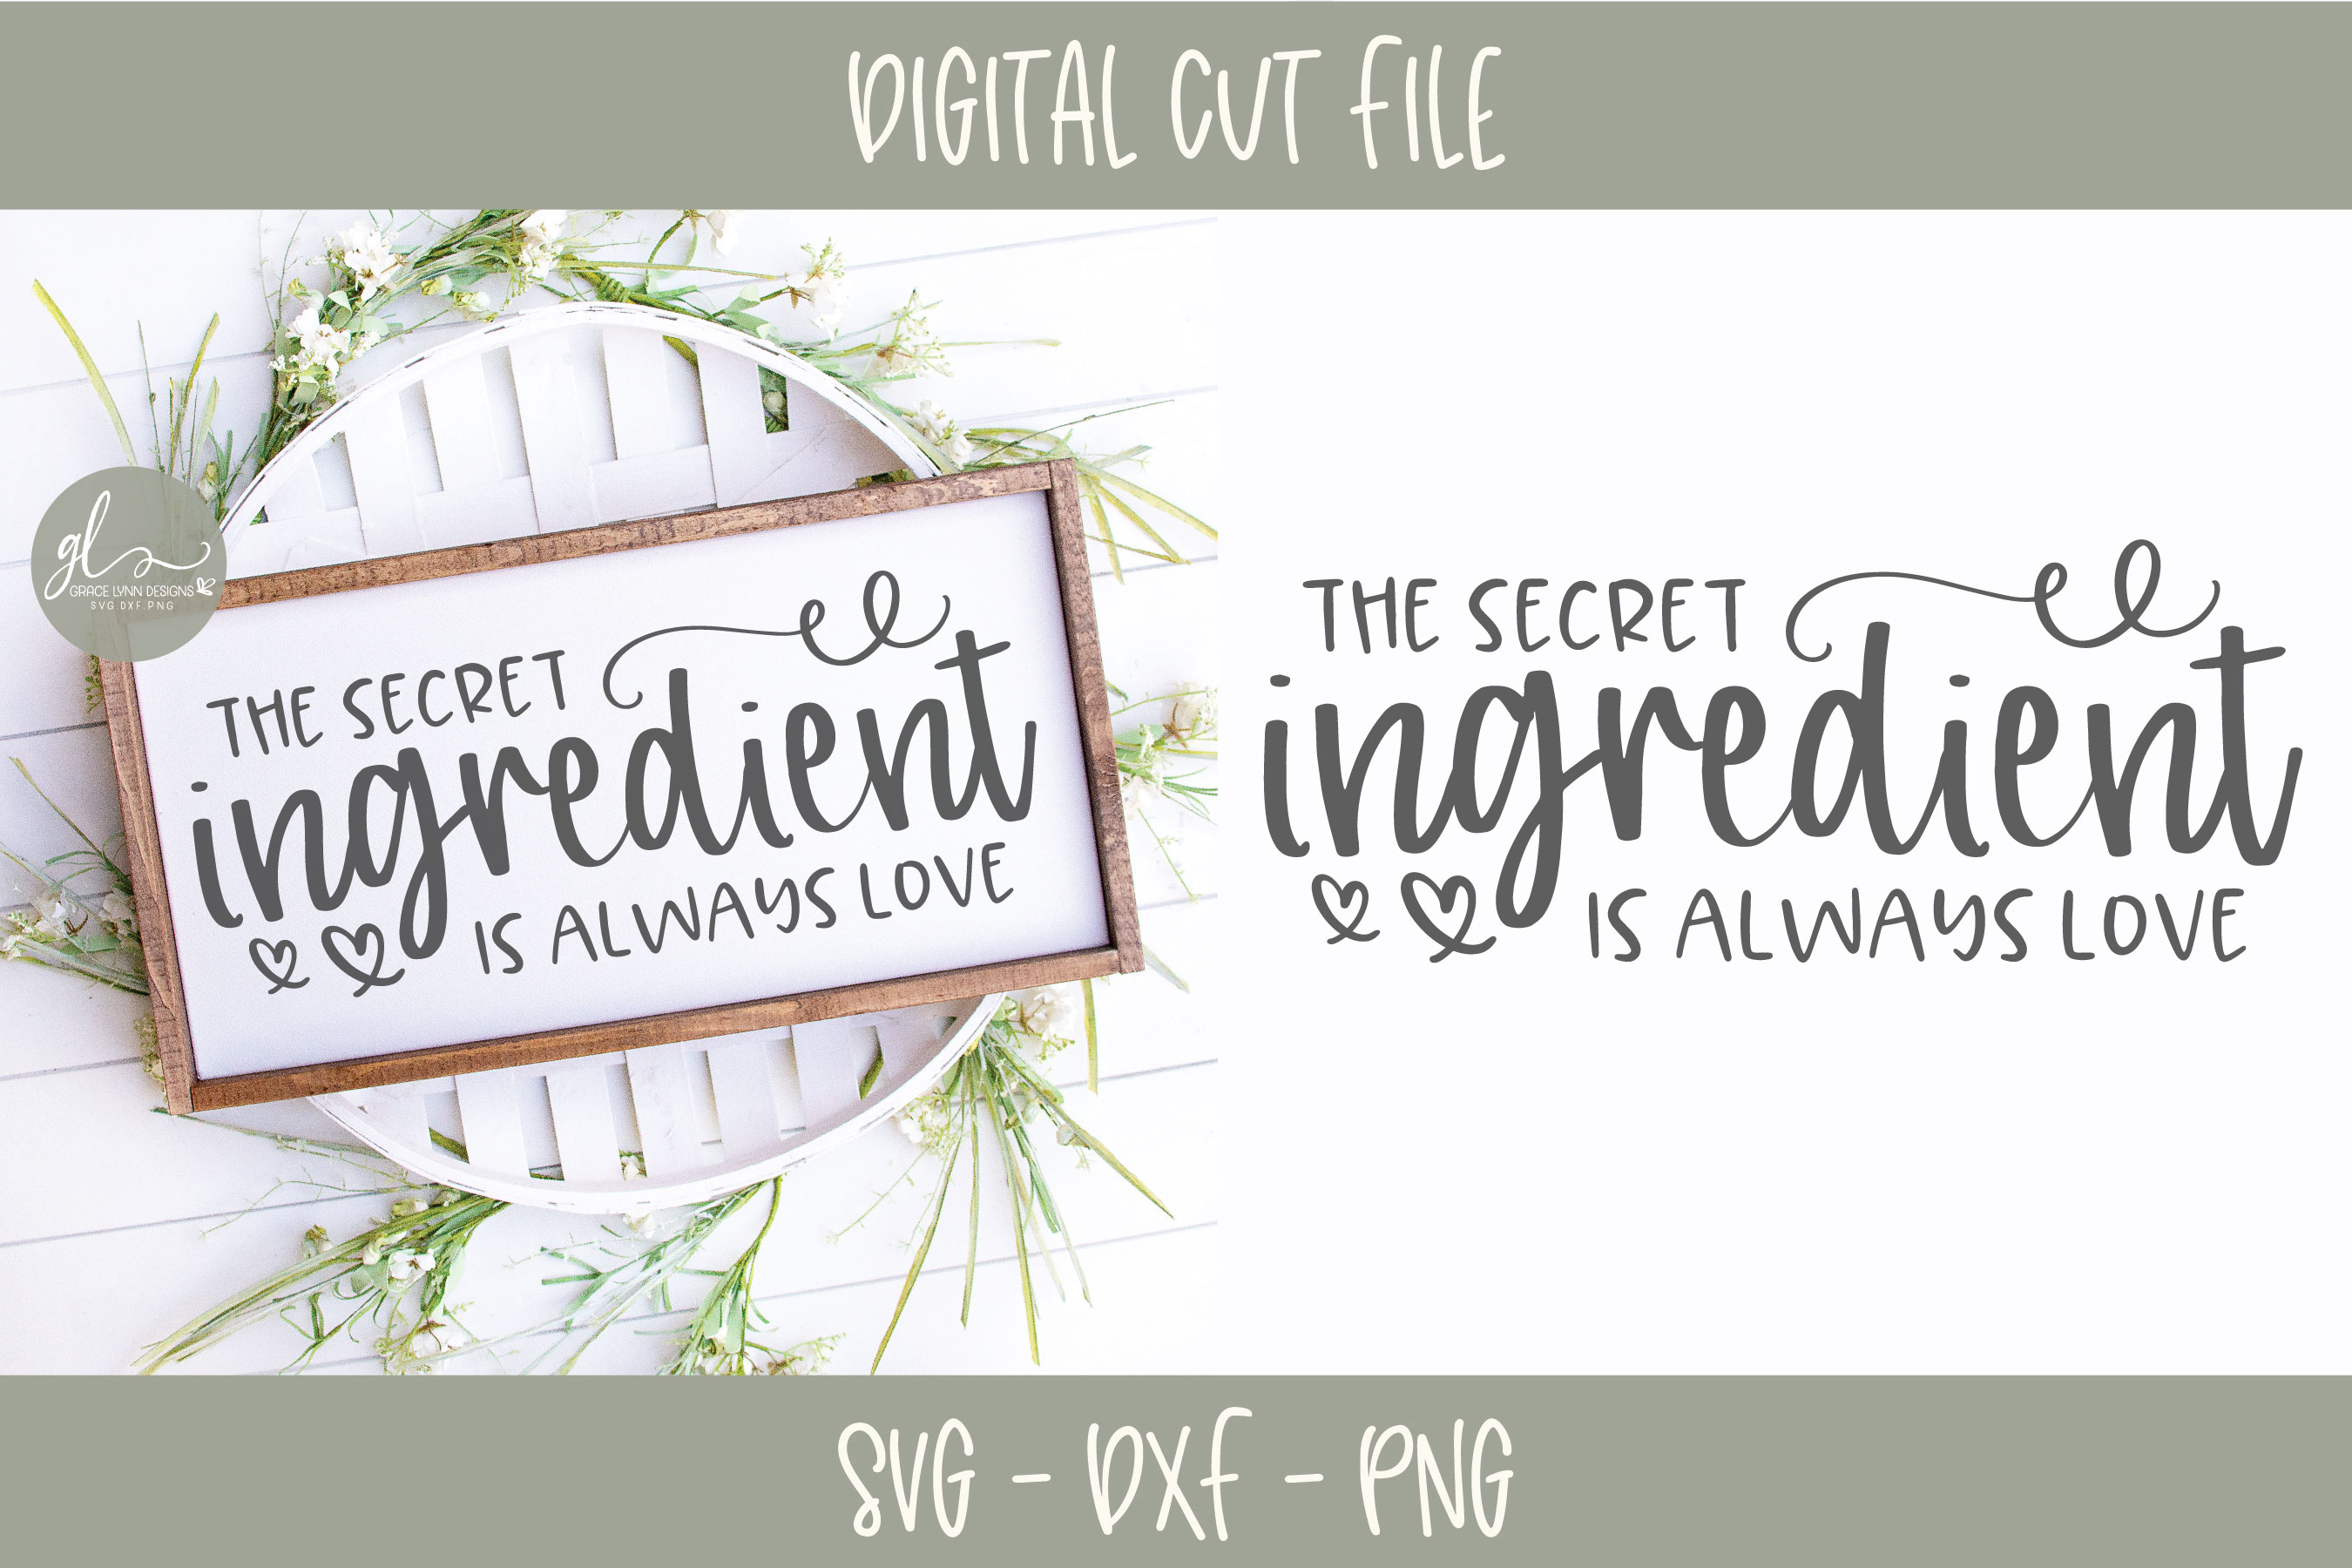 The Secret Ingredient Is Always Love - SVG example image 1